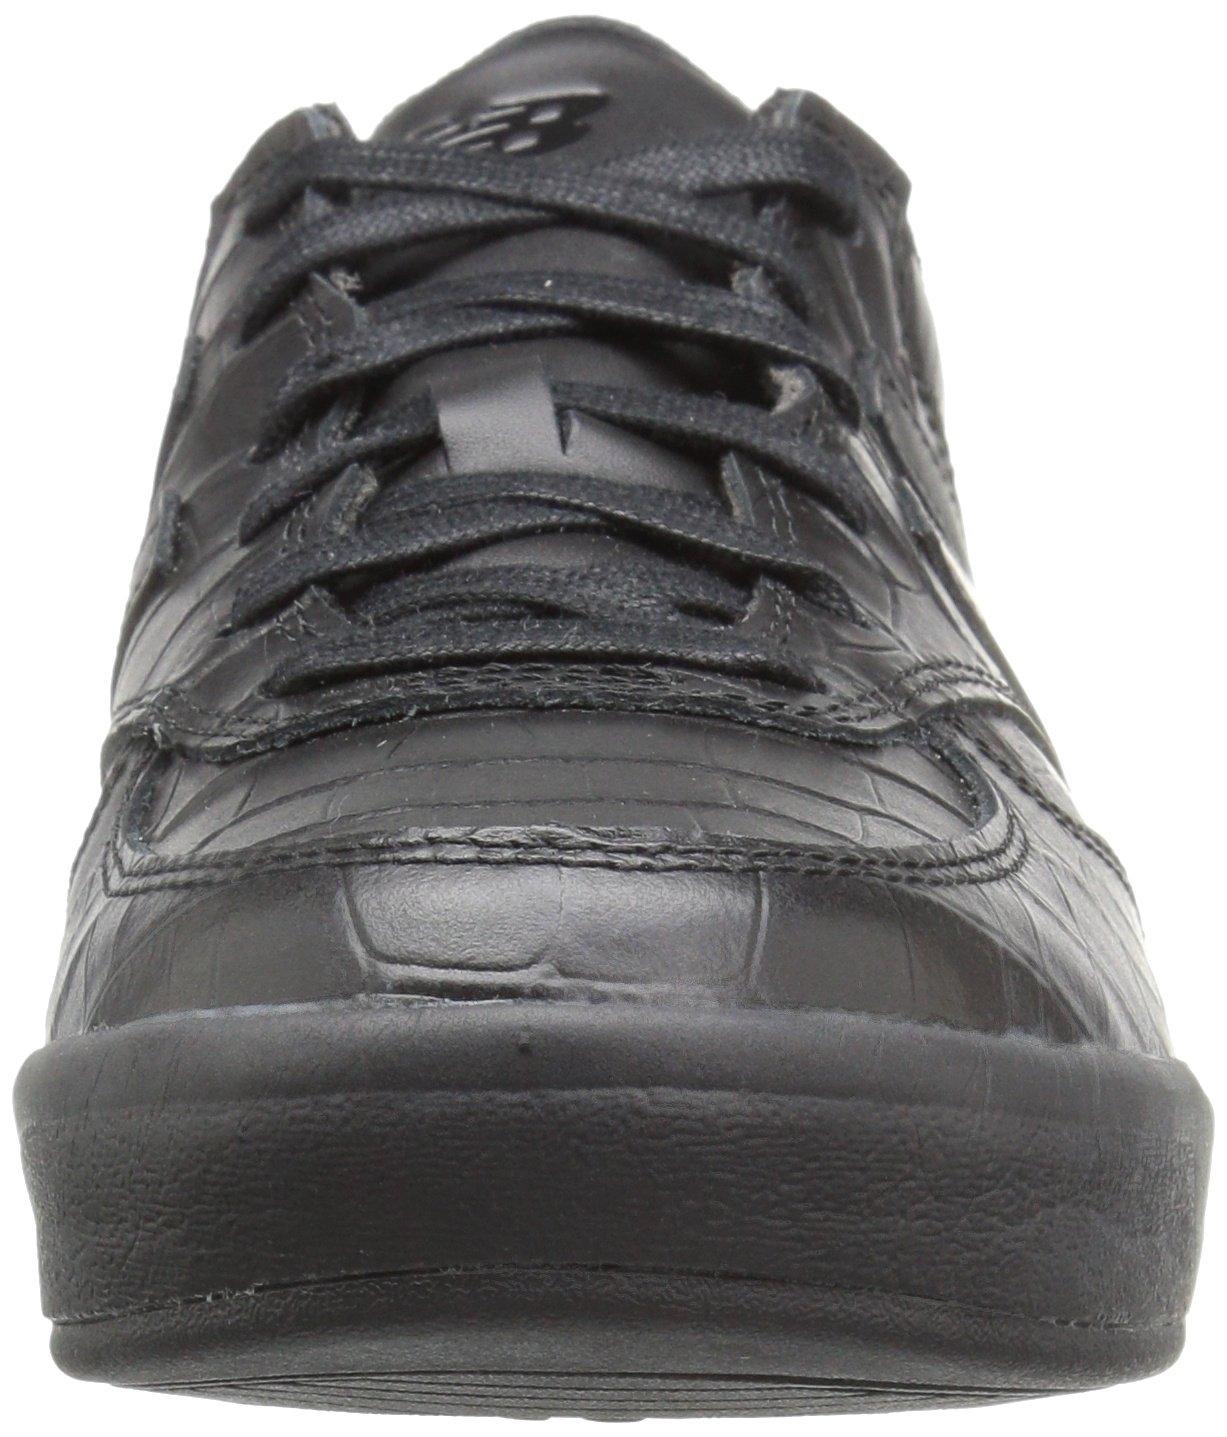 New Balance Women's 300v1 US|Black/Black Sneaker B01NAMVU1U 9 D US|Black/Black 300v1 b39d16